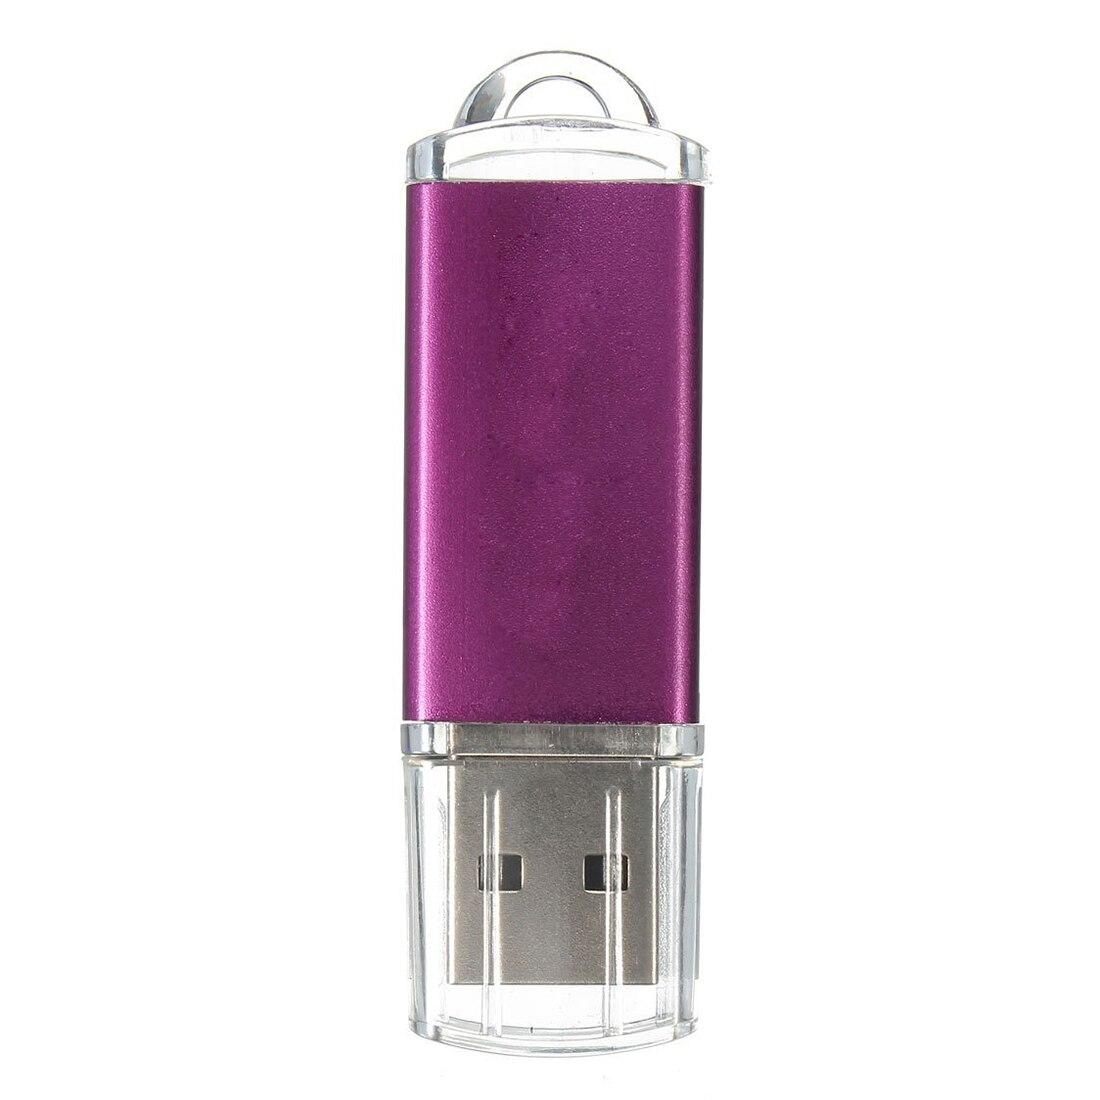 Better Shopping Better Living 32GB USB Stick 2.0 Memory Stick Flash Drive Memory Stick data storage Stick Purple